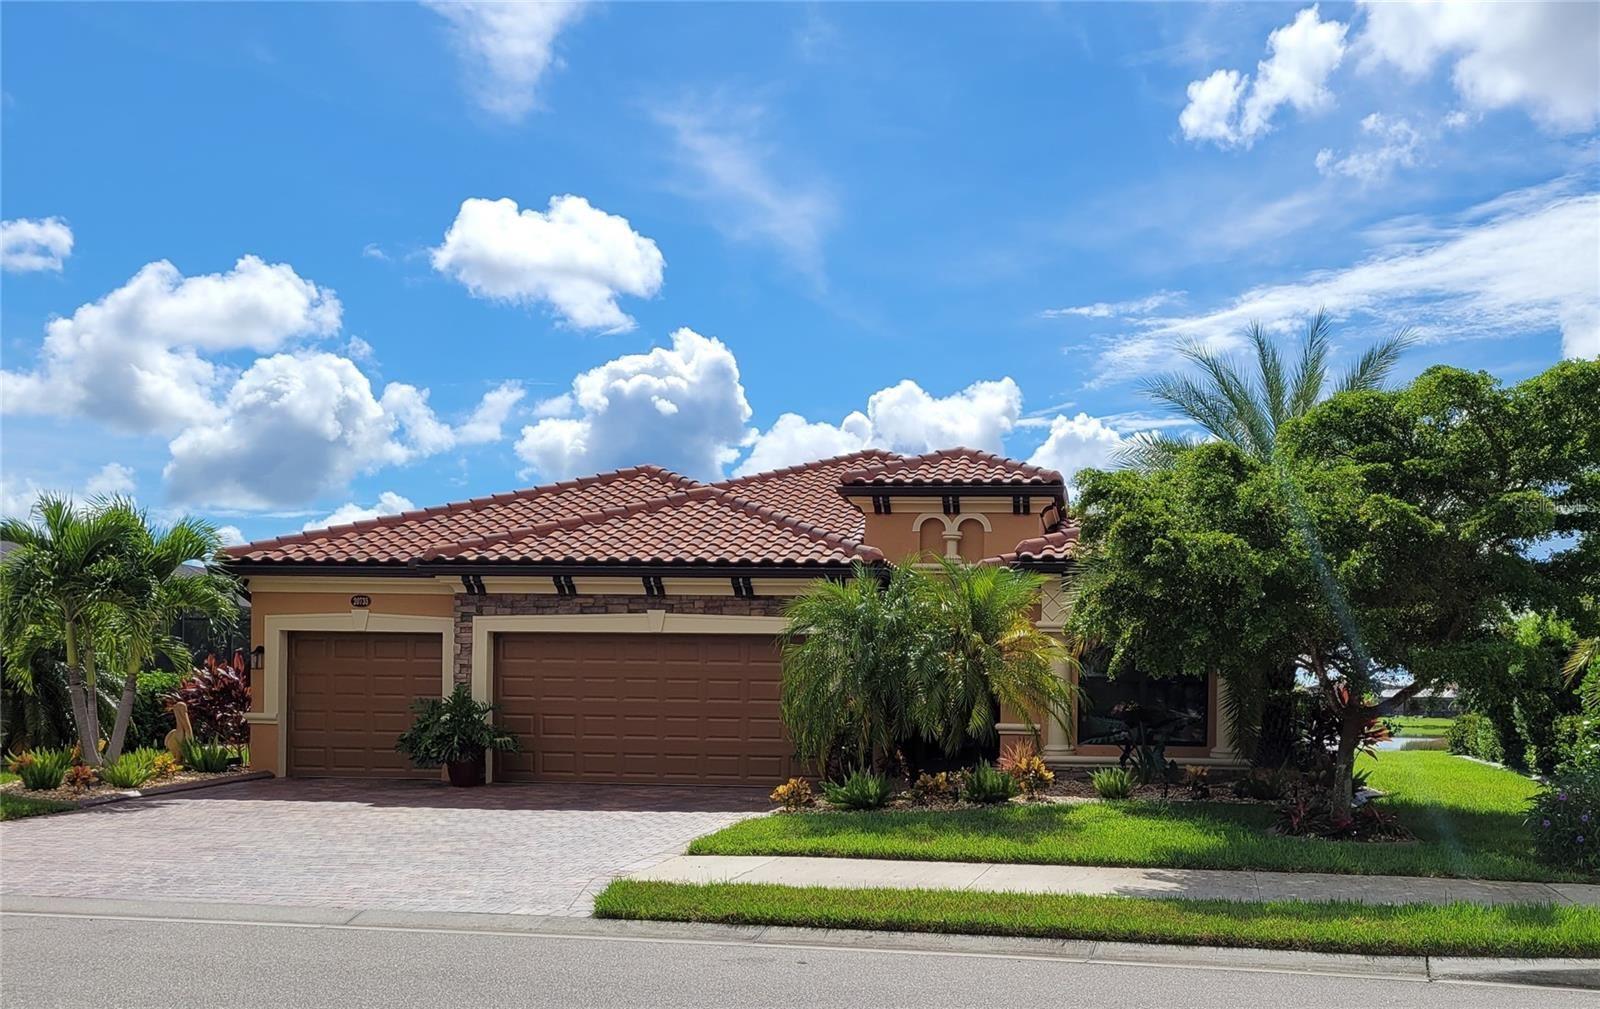 Photo of 20735 GRANLAGO DRIVE, VENICE, FL 34293 (MLS # A4513209)